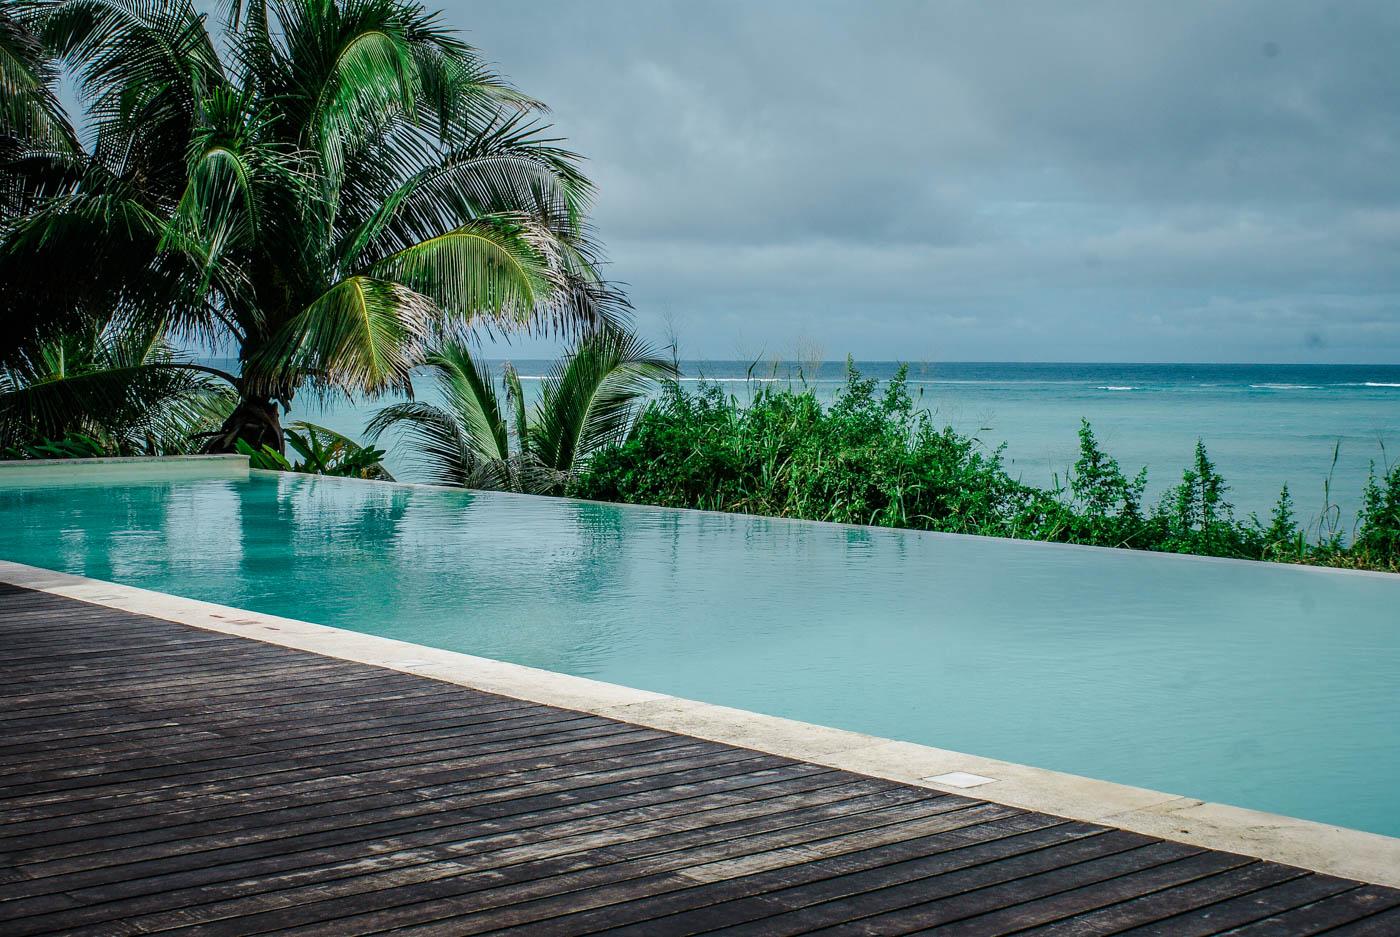 Infinity pool - Melia Zanzibar. Tanzania and Zanzibar - an exotic adventure.